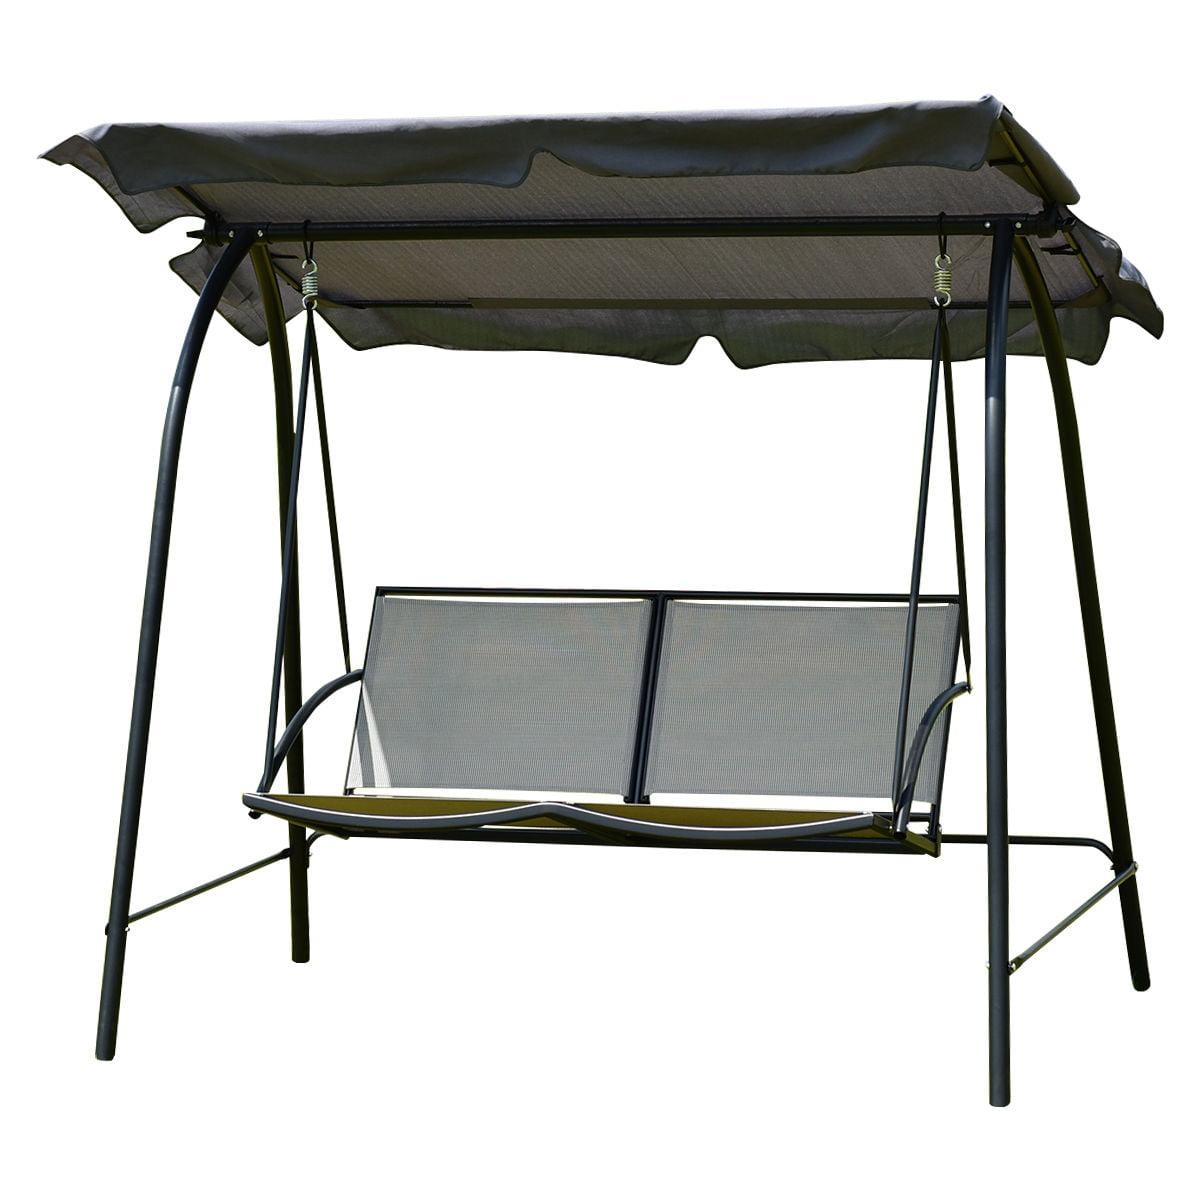 Gymax Patio Loveseat Canopy Swing Glider Hammock Cushioned Steel